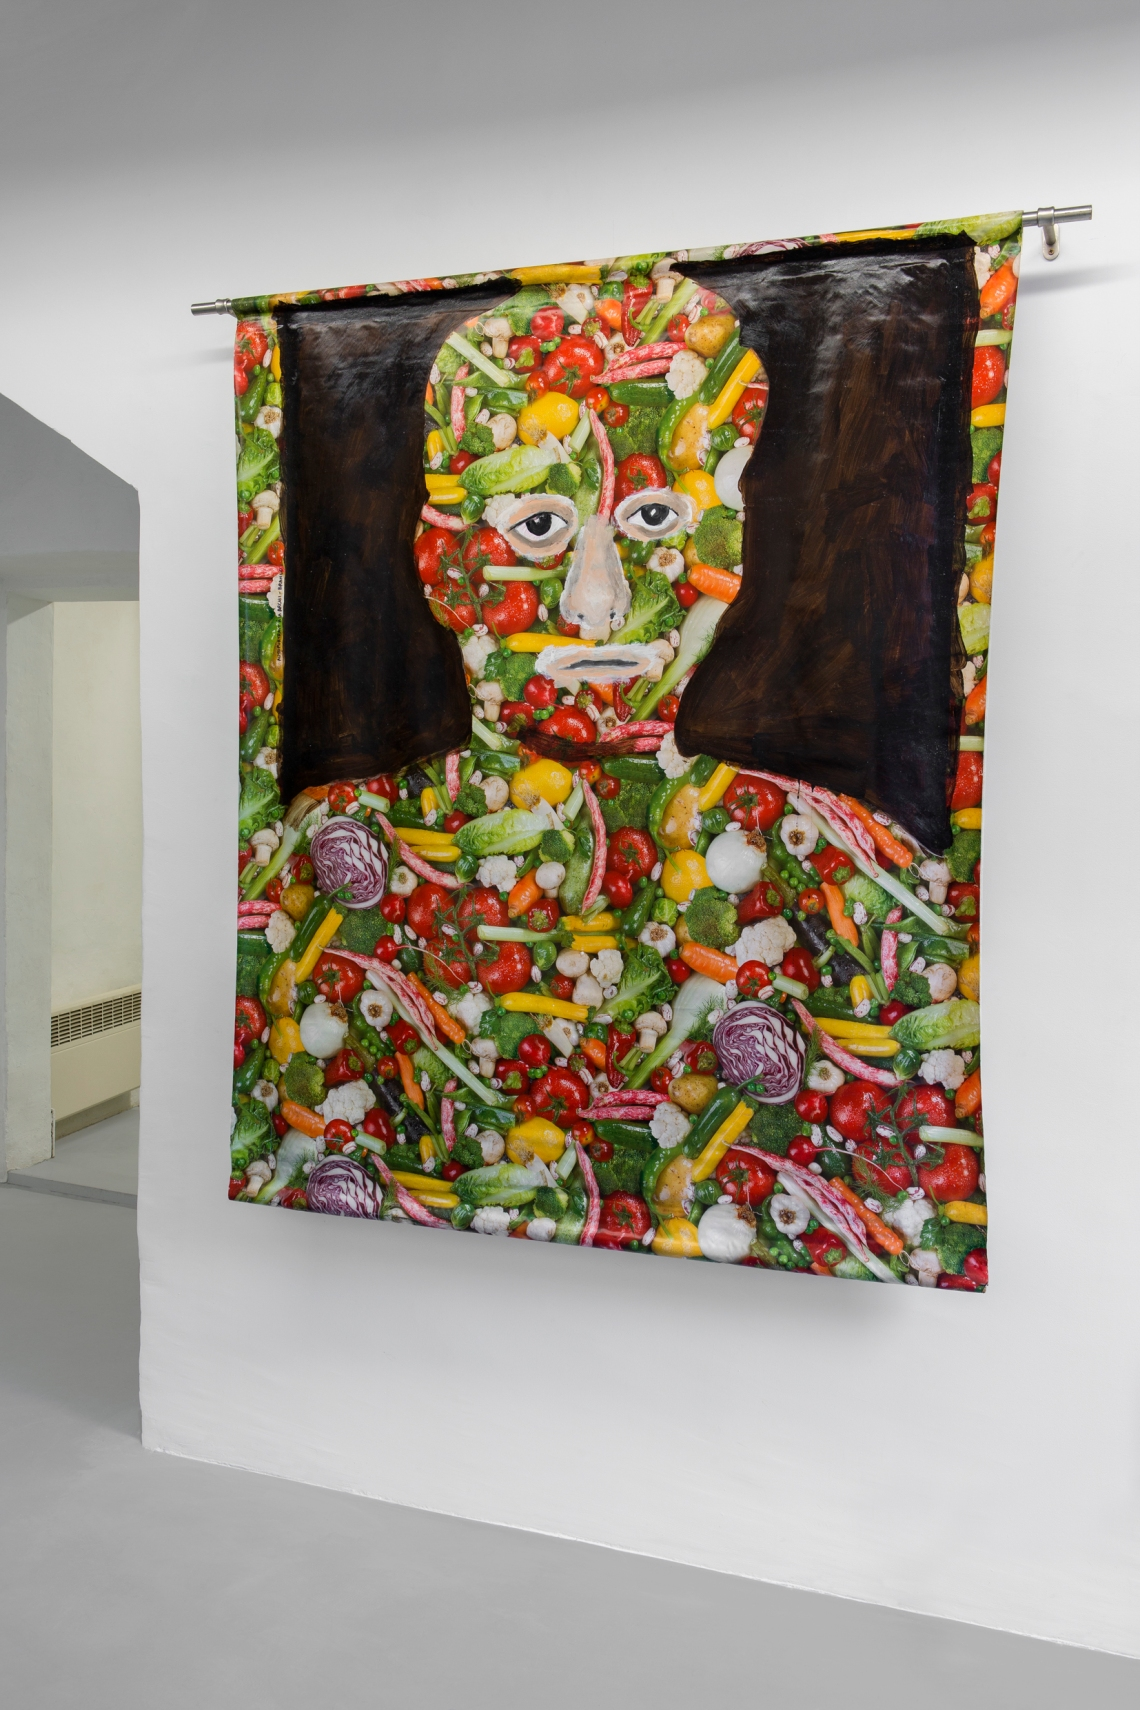 exposition collection LGR -CAC de St Restitut